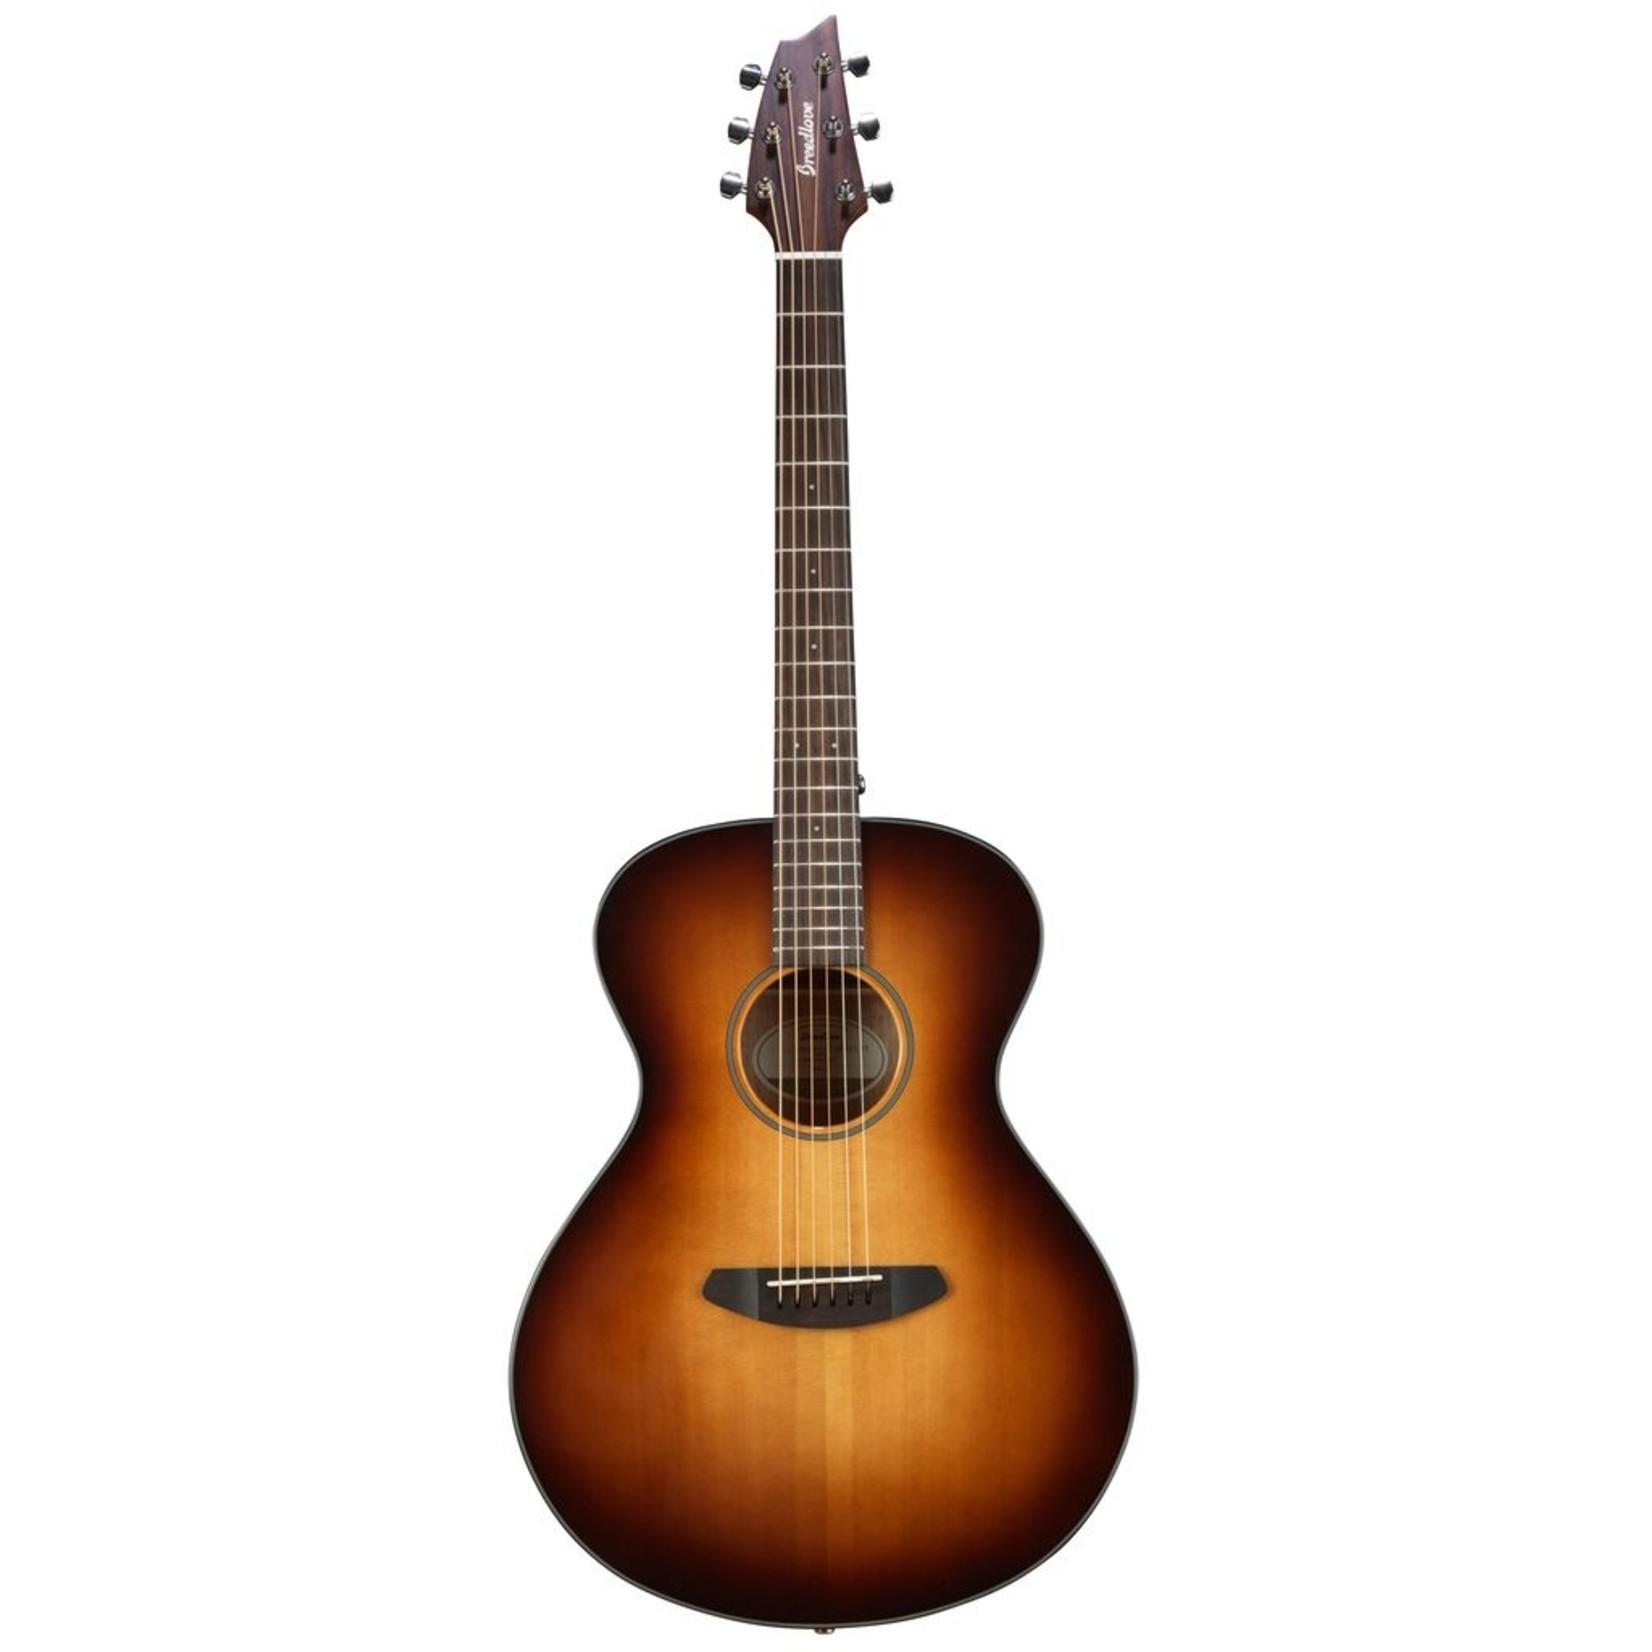 Breedlove Breedlove Discovery Concert Sunburst Acoustic Guitar